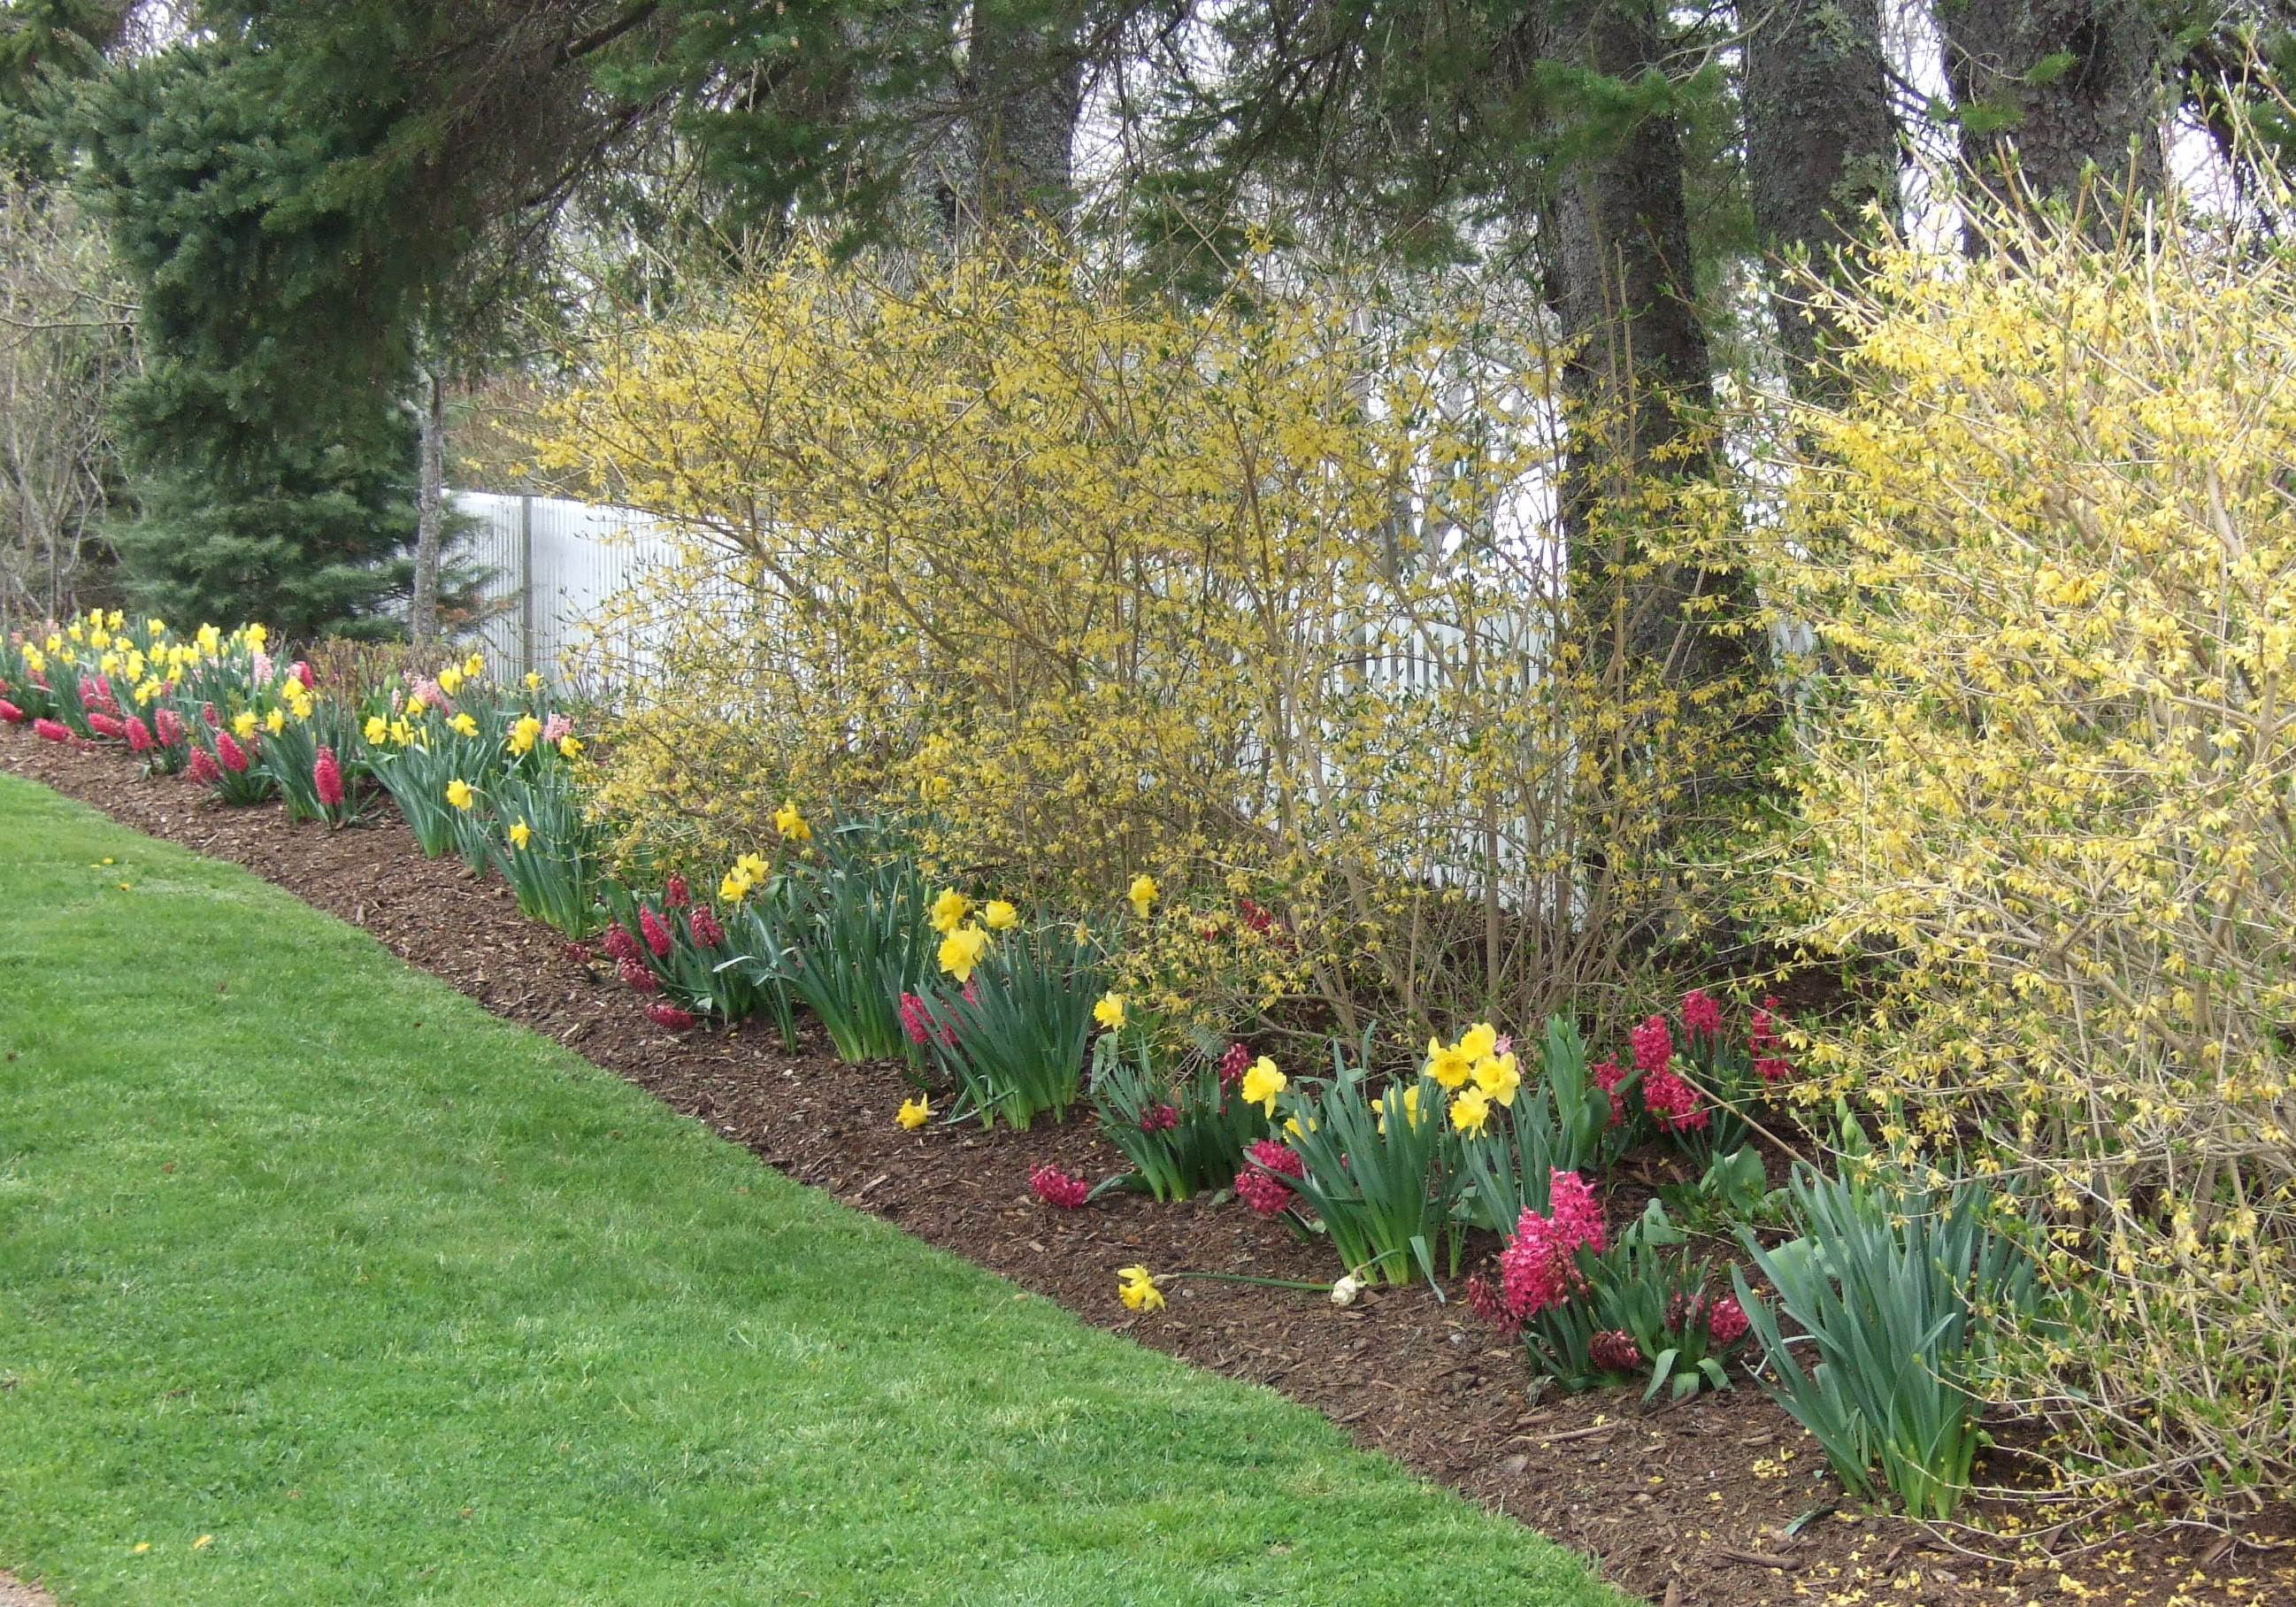 daffodils and hyacinths make a bright border